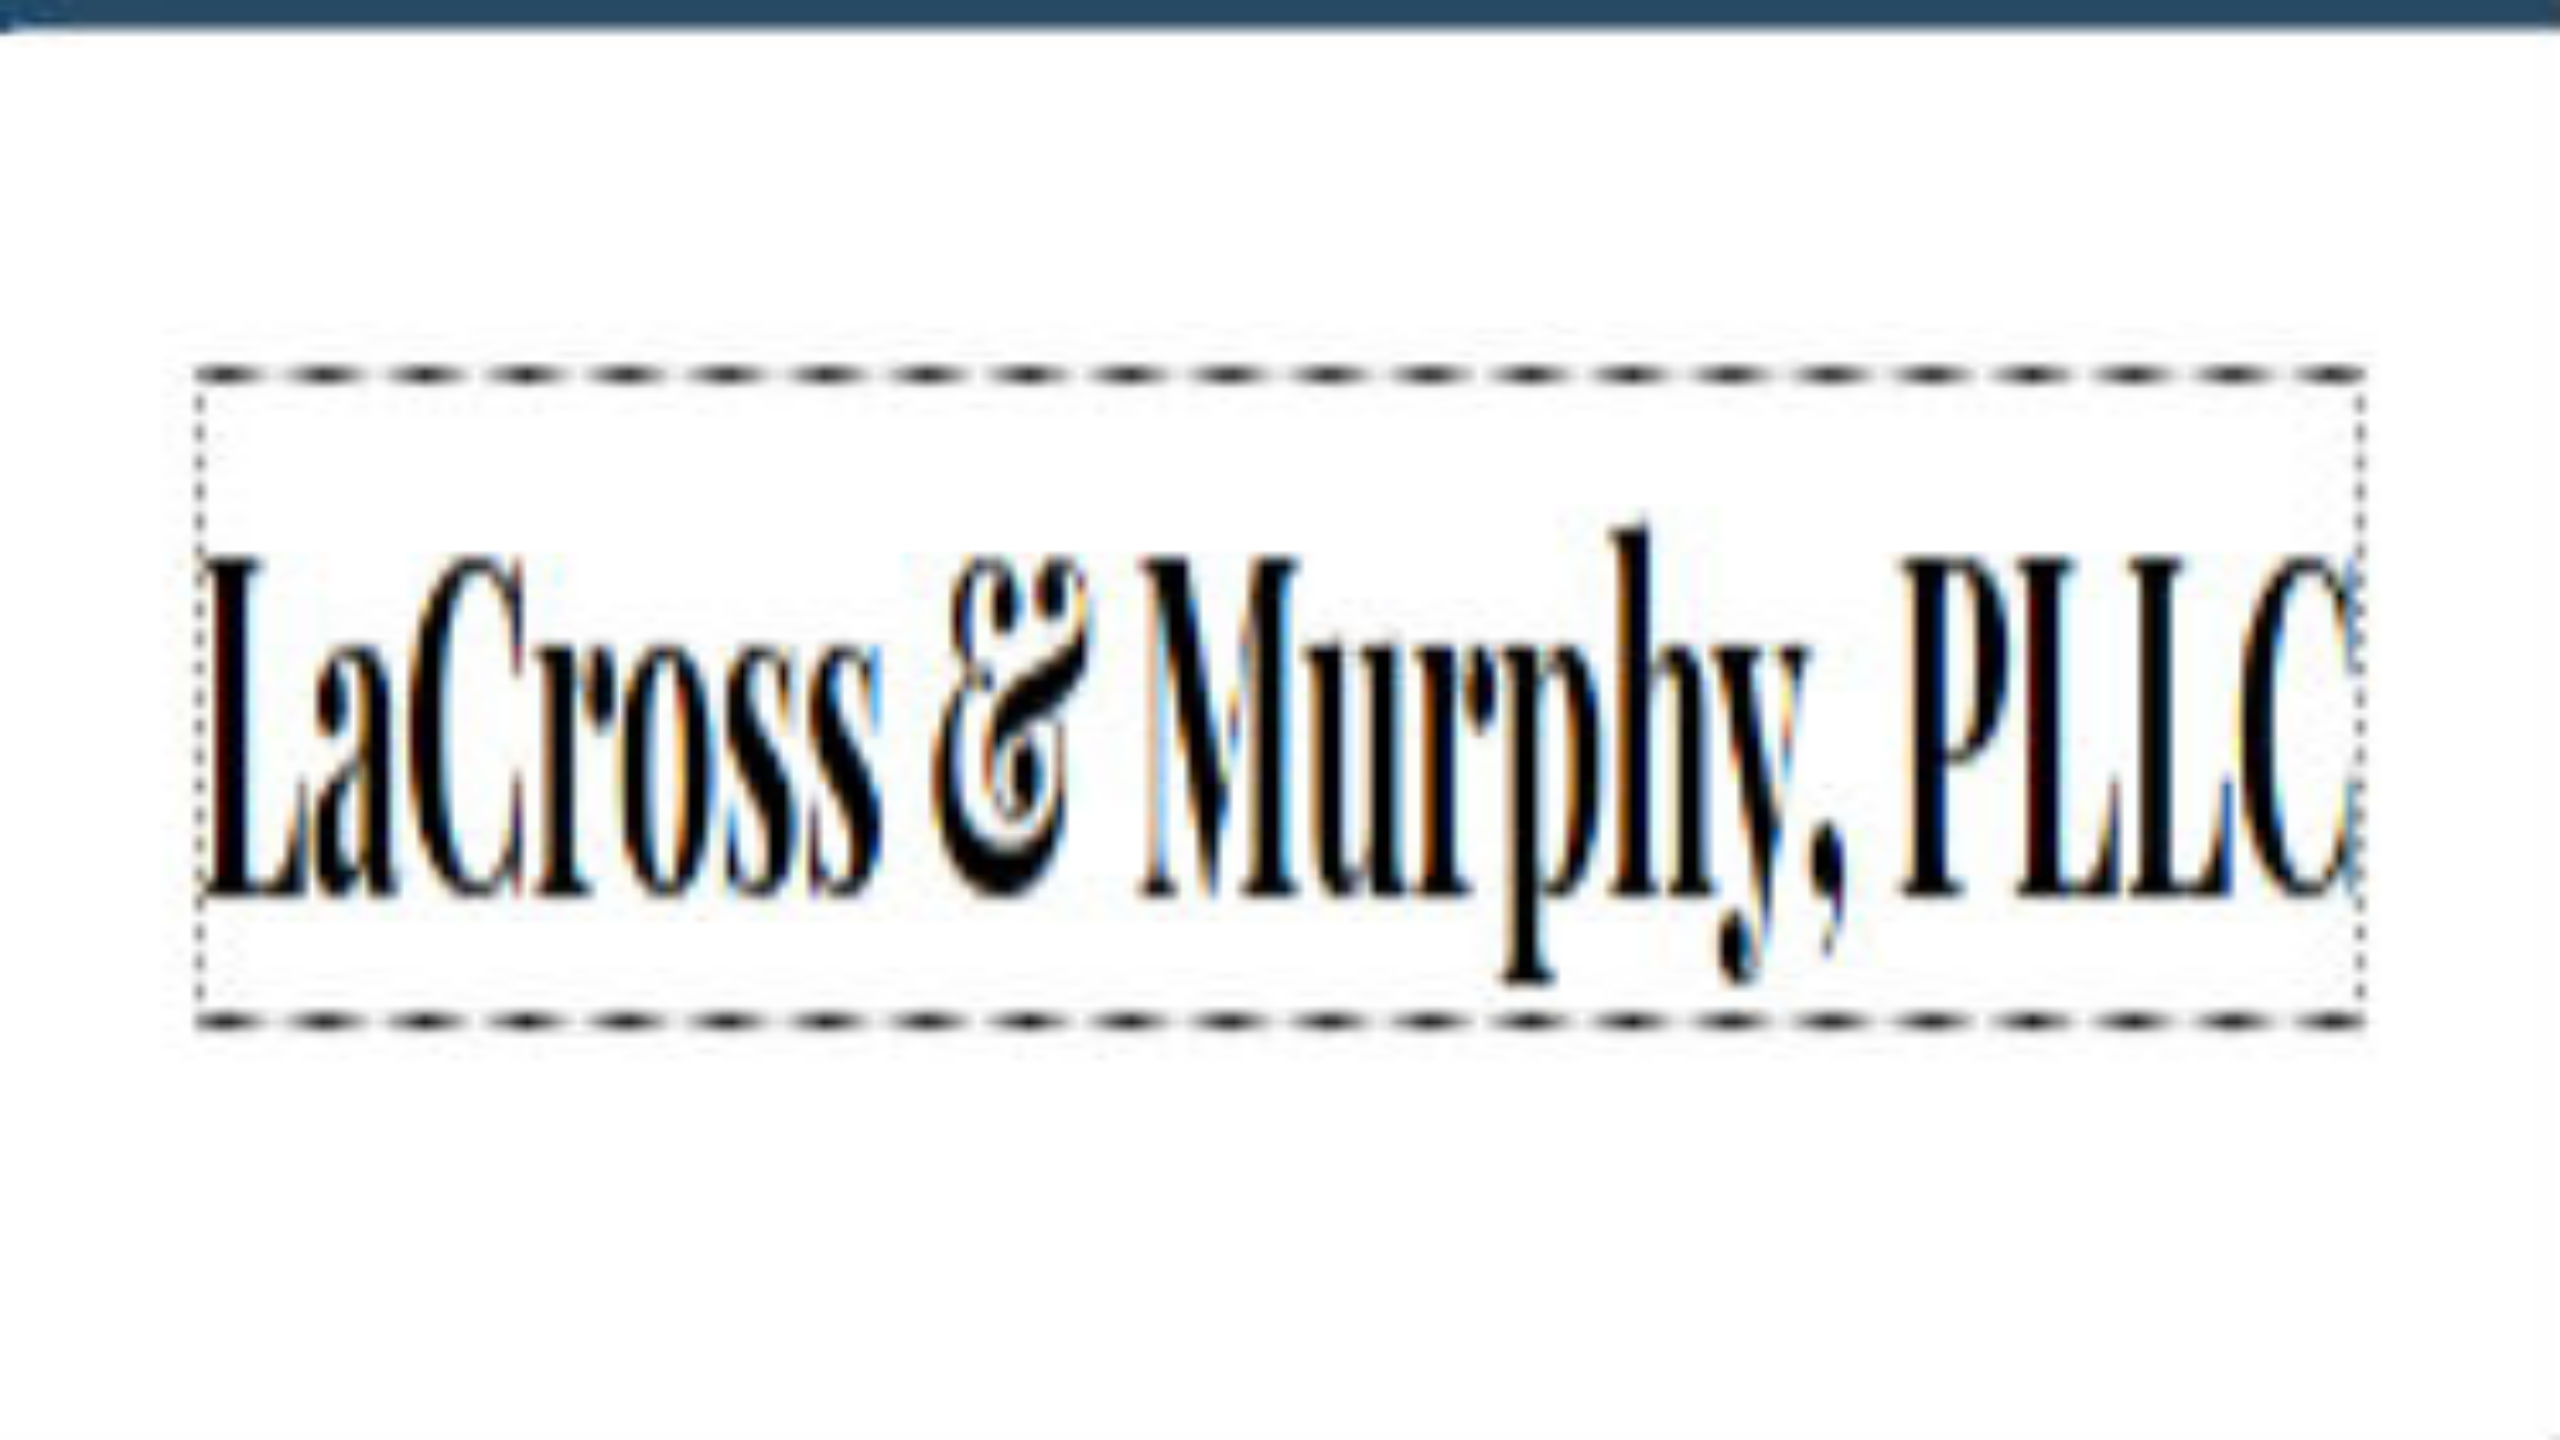 LaCross & Murphy PLLC (@lacrossandmurphy) Cover Image